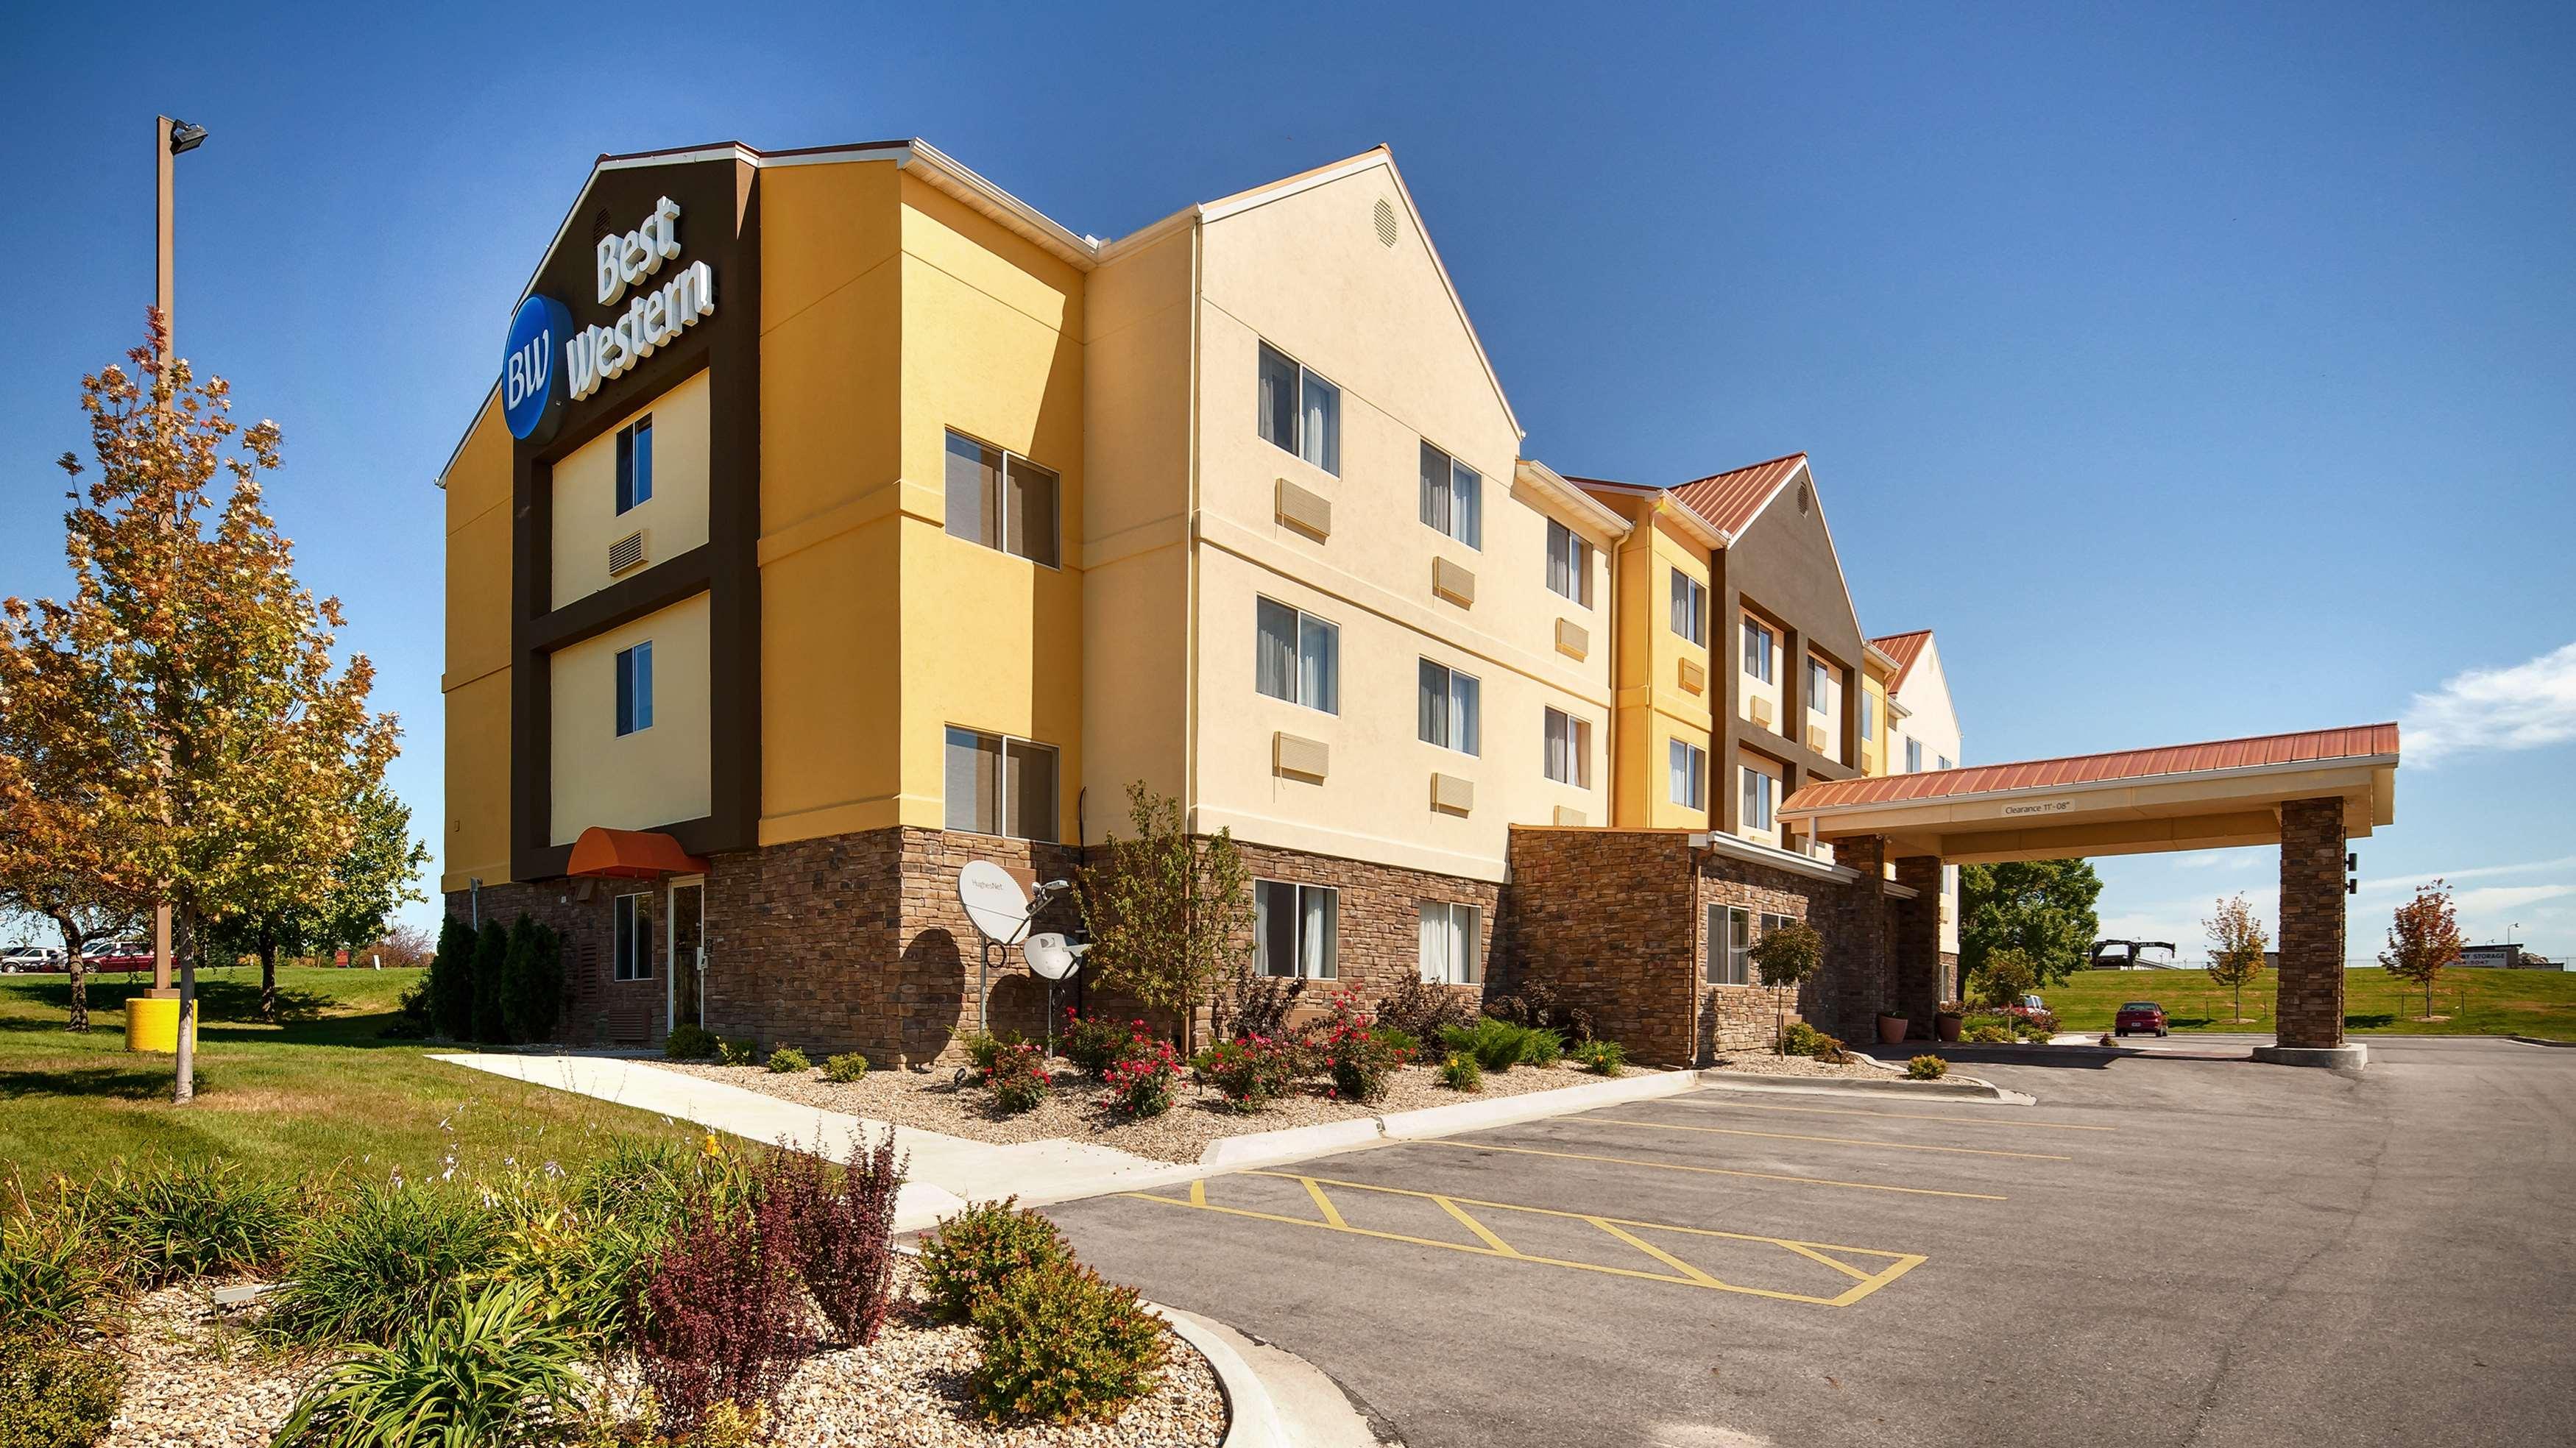 Best Western Pearl City Inn image 1